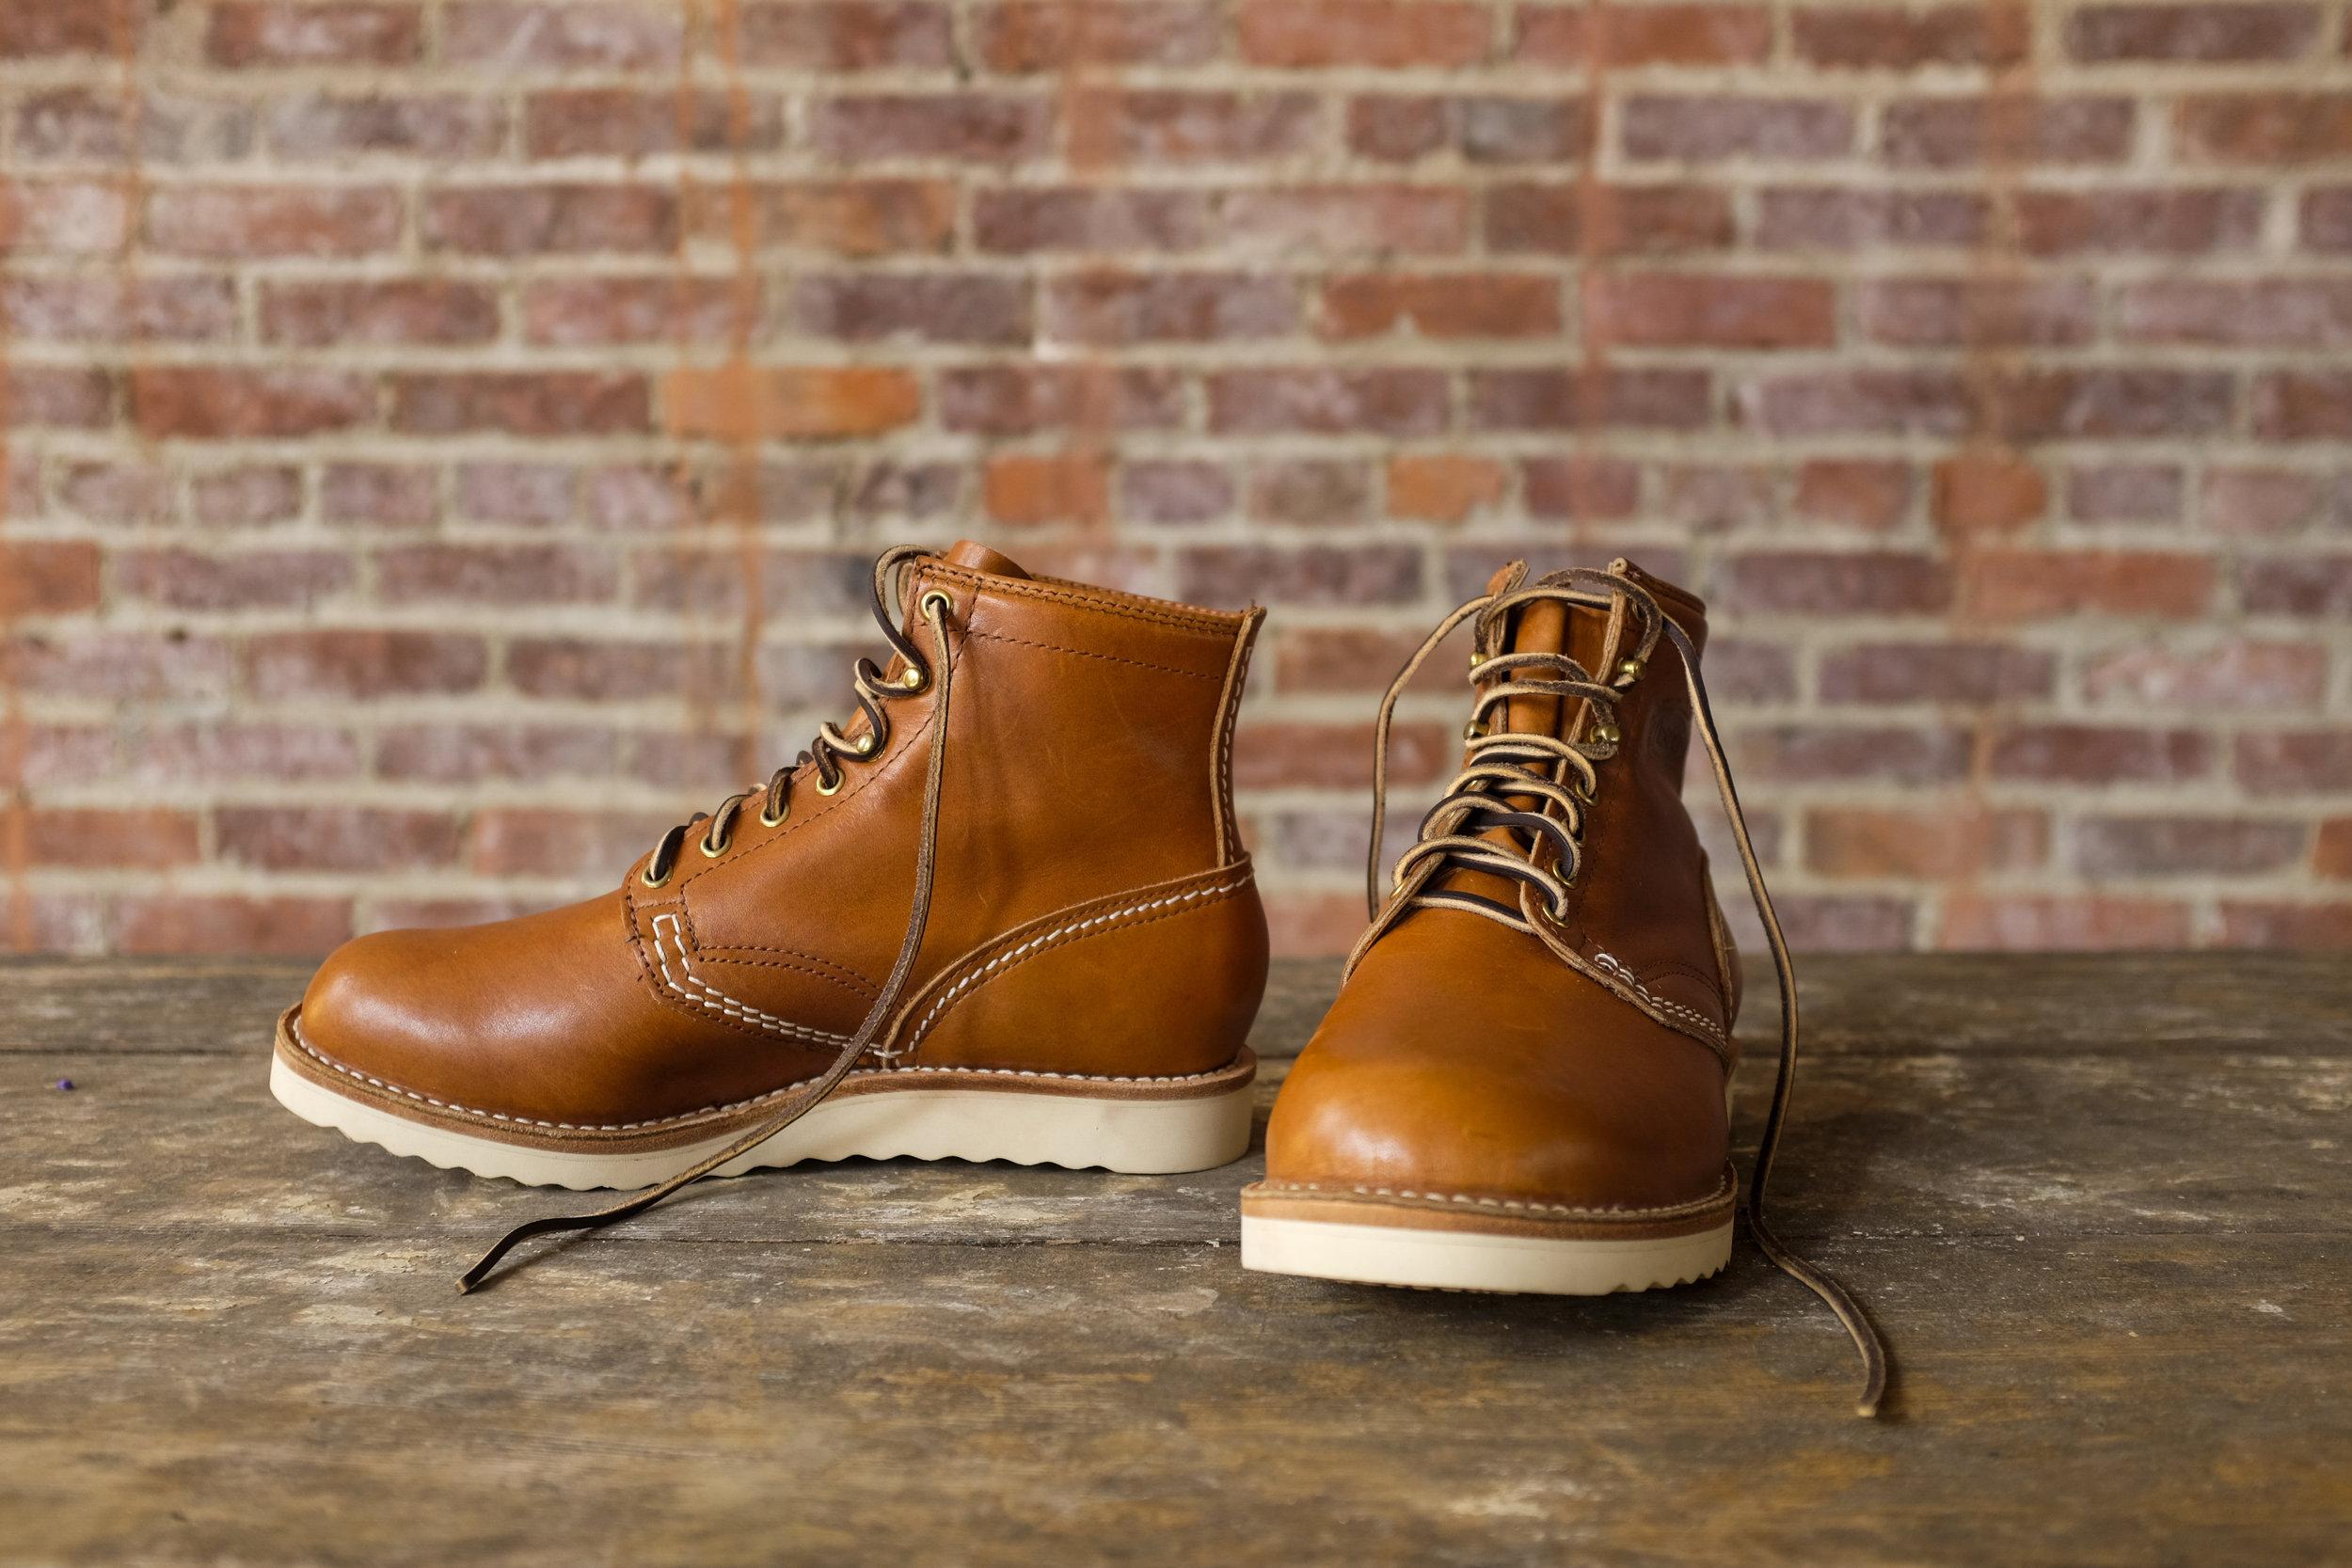 Horween Leather Wesco Boots Black Bear Brand Rio Latigo jobmaster